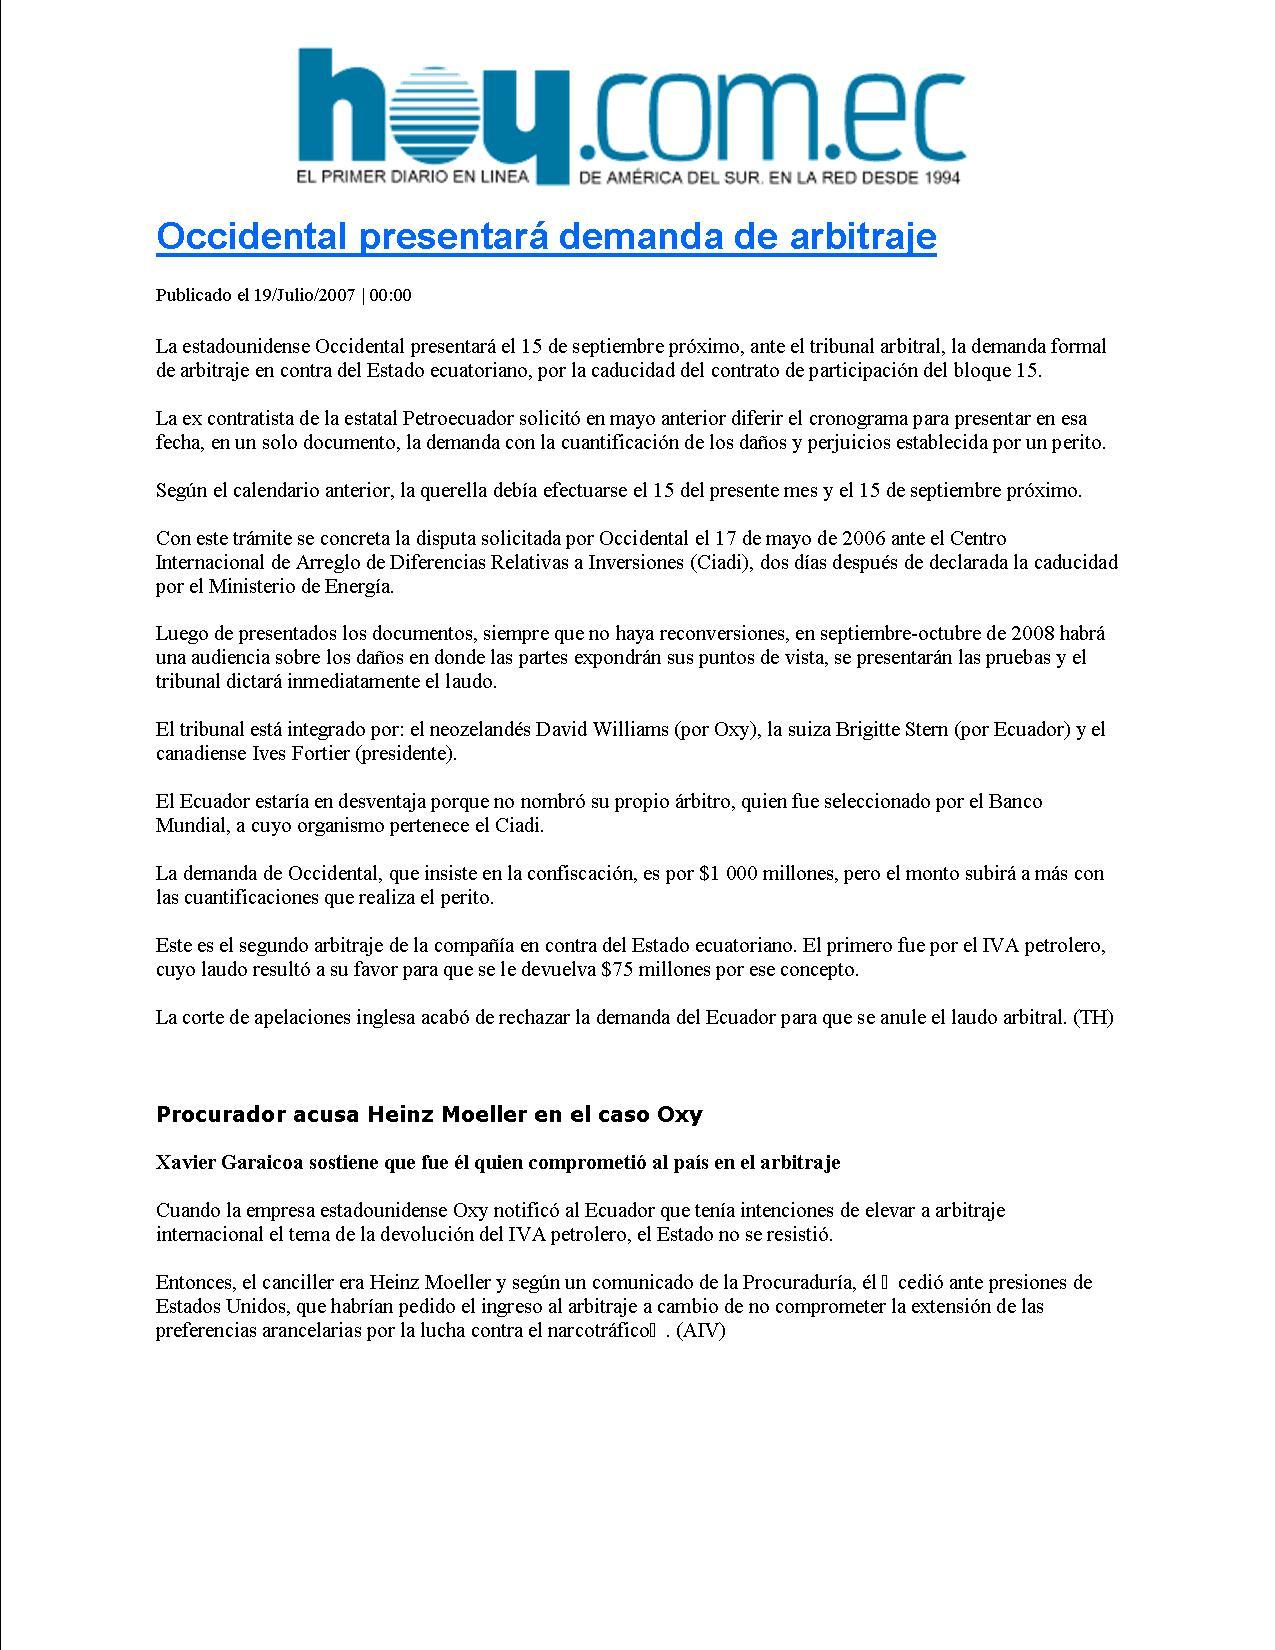 14-HOY 19-07-2007Occidental presentara demanda de arbitraje